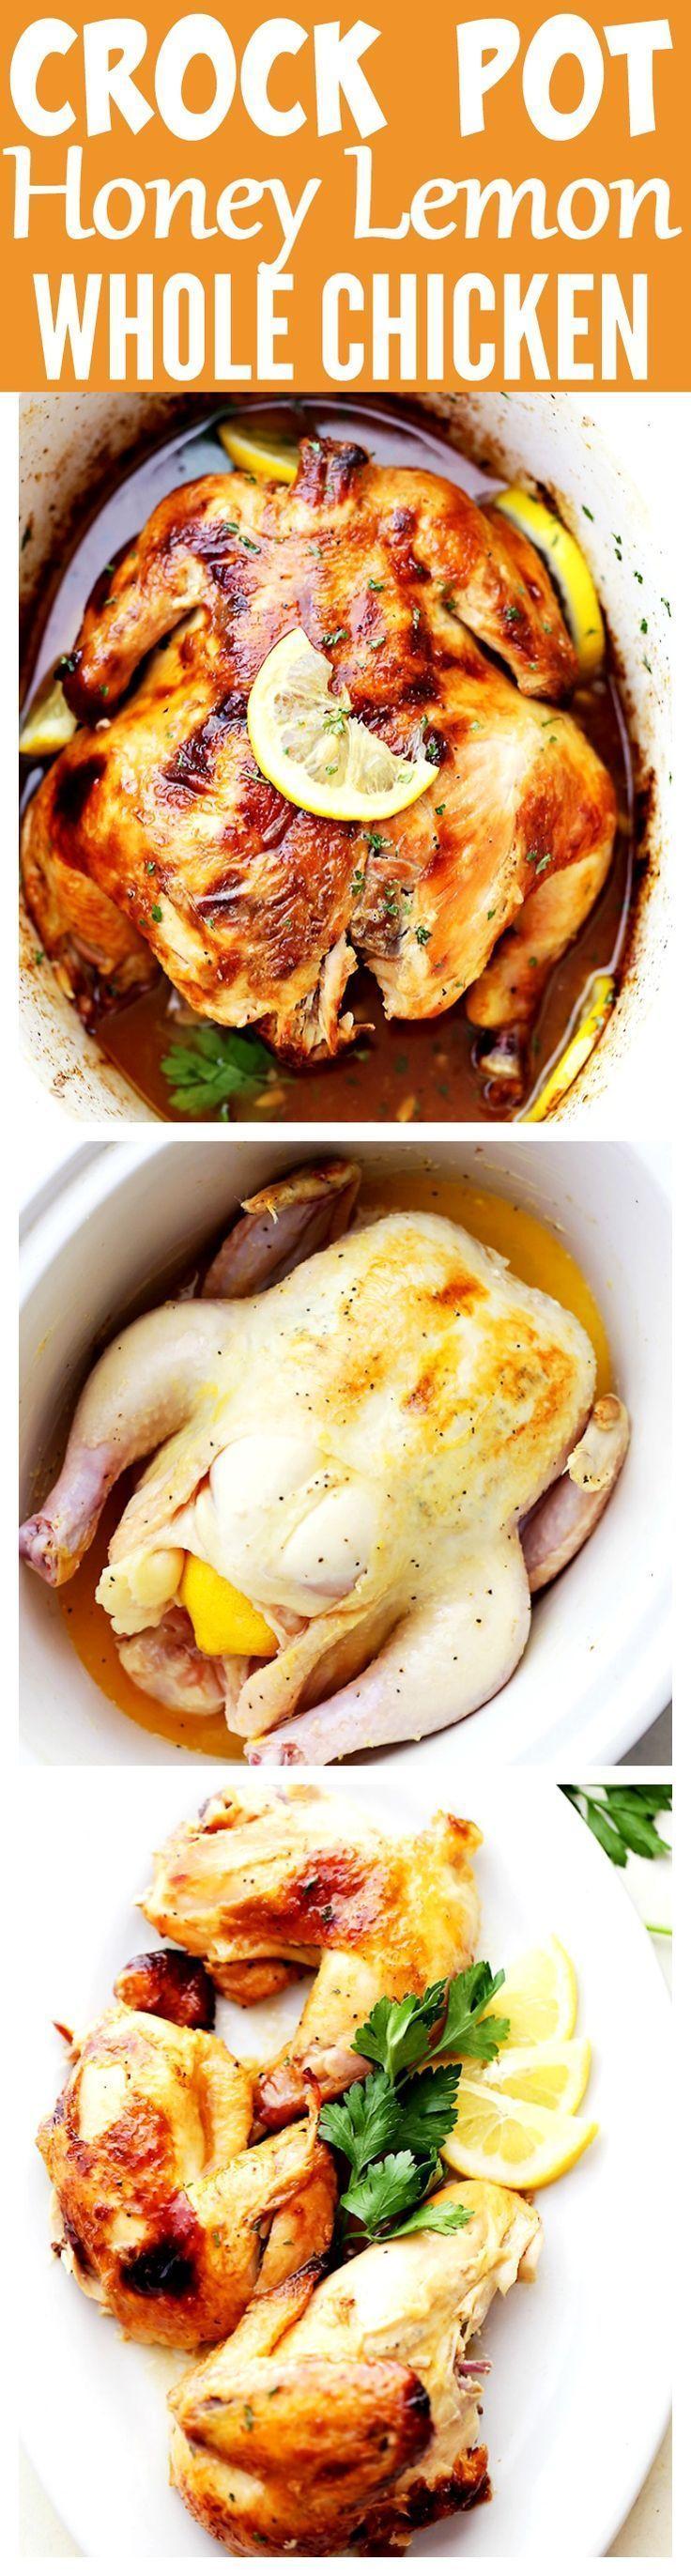 Crock Pot Honey Lemon Chicken